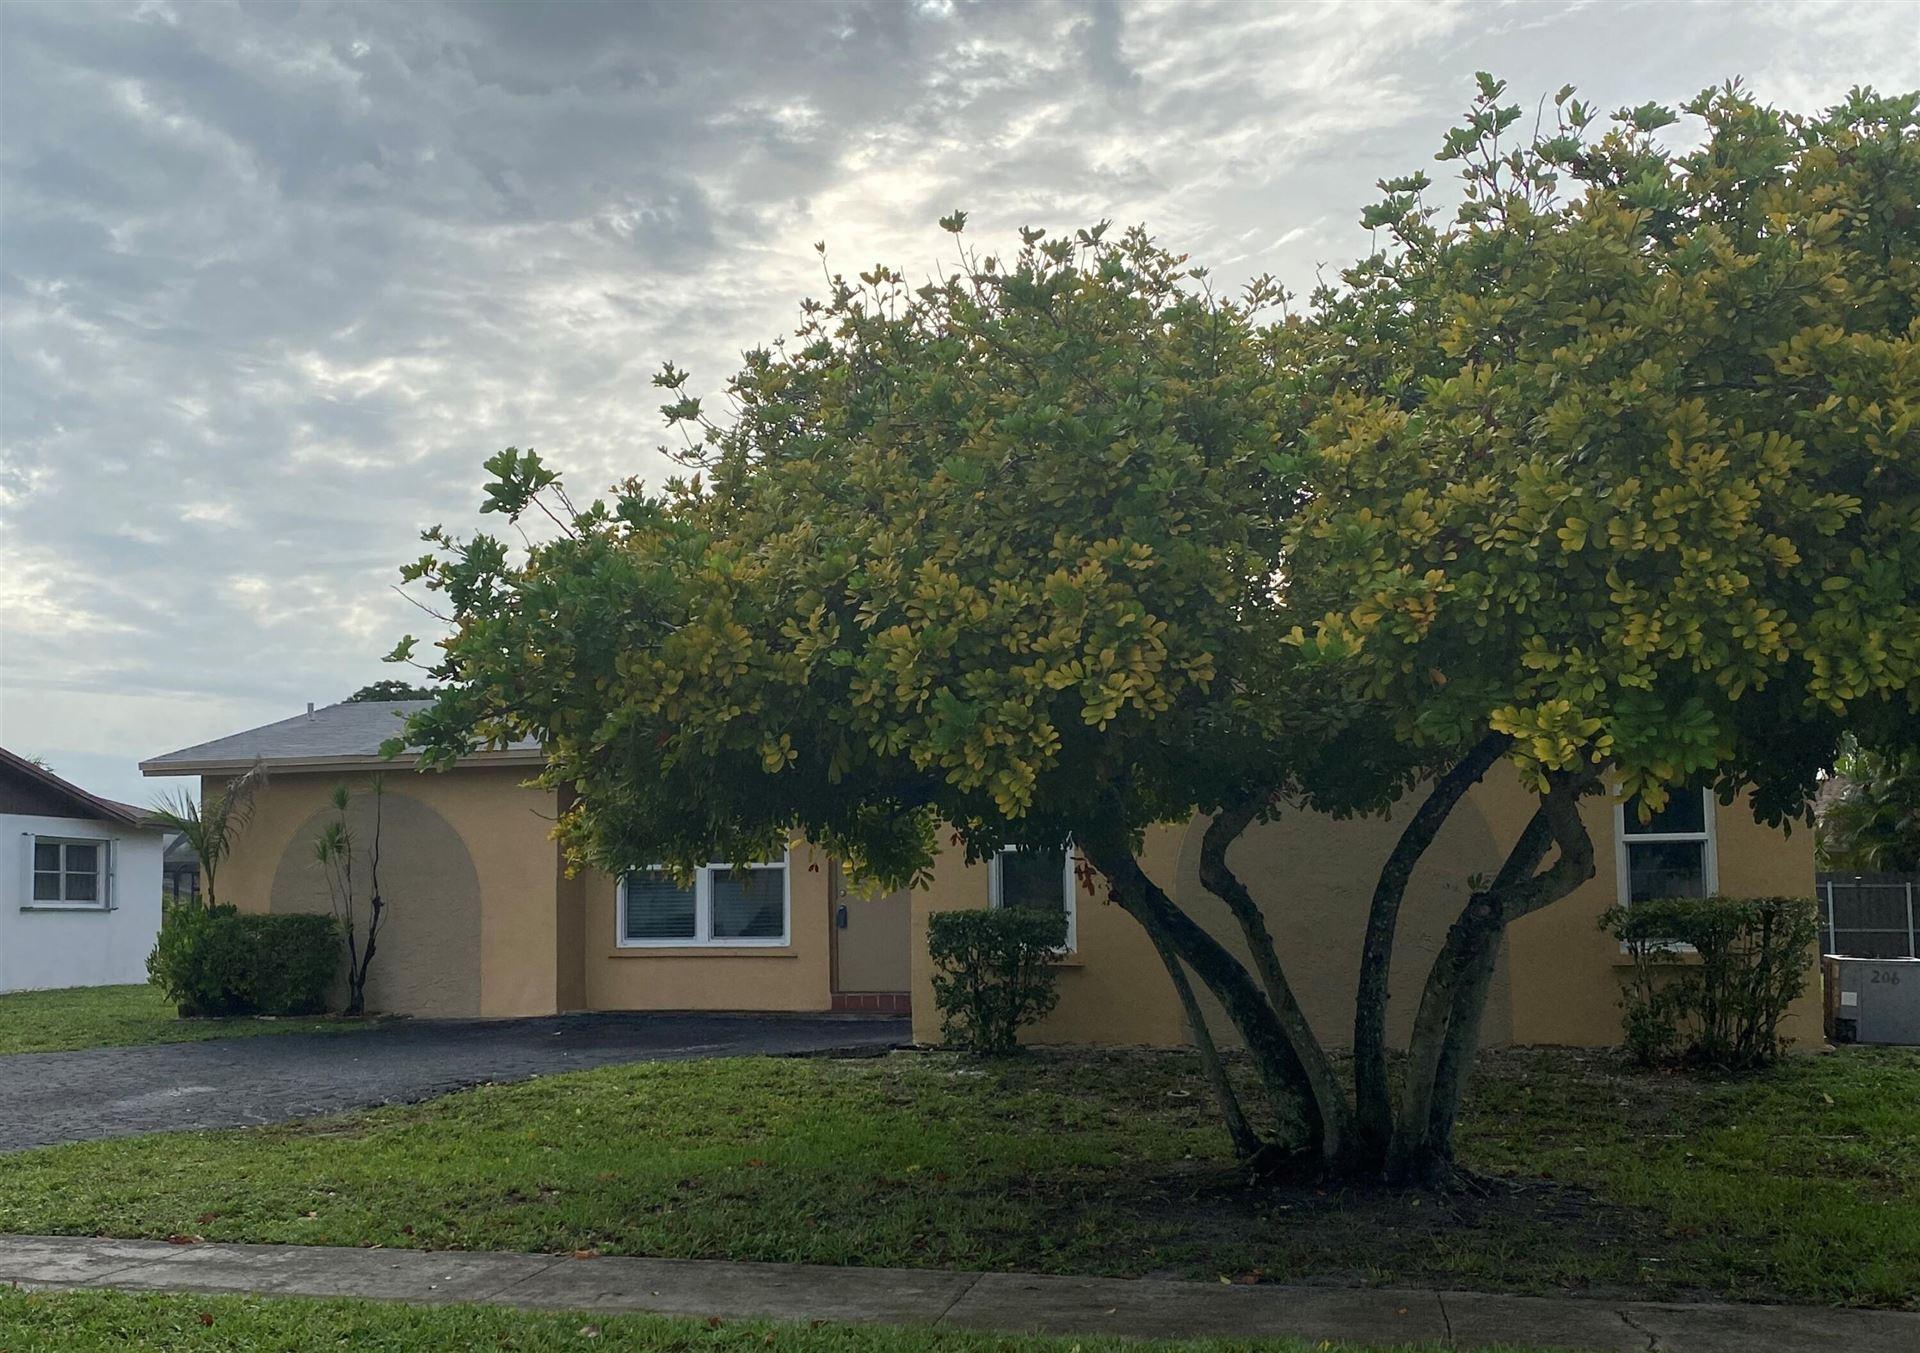 1111 NW 93rd Terrace, Pembroke Pines, FL 33024 - #: RX-10724916